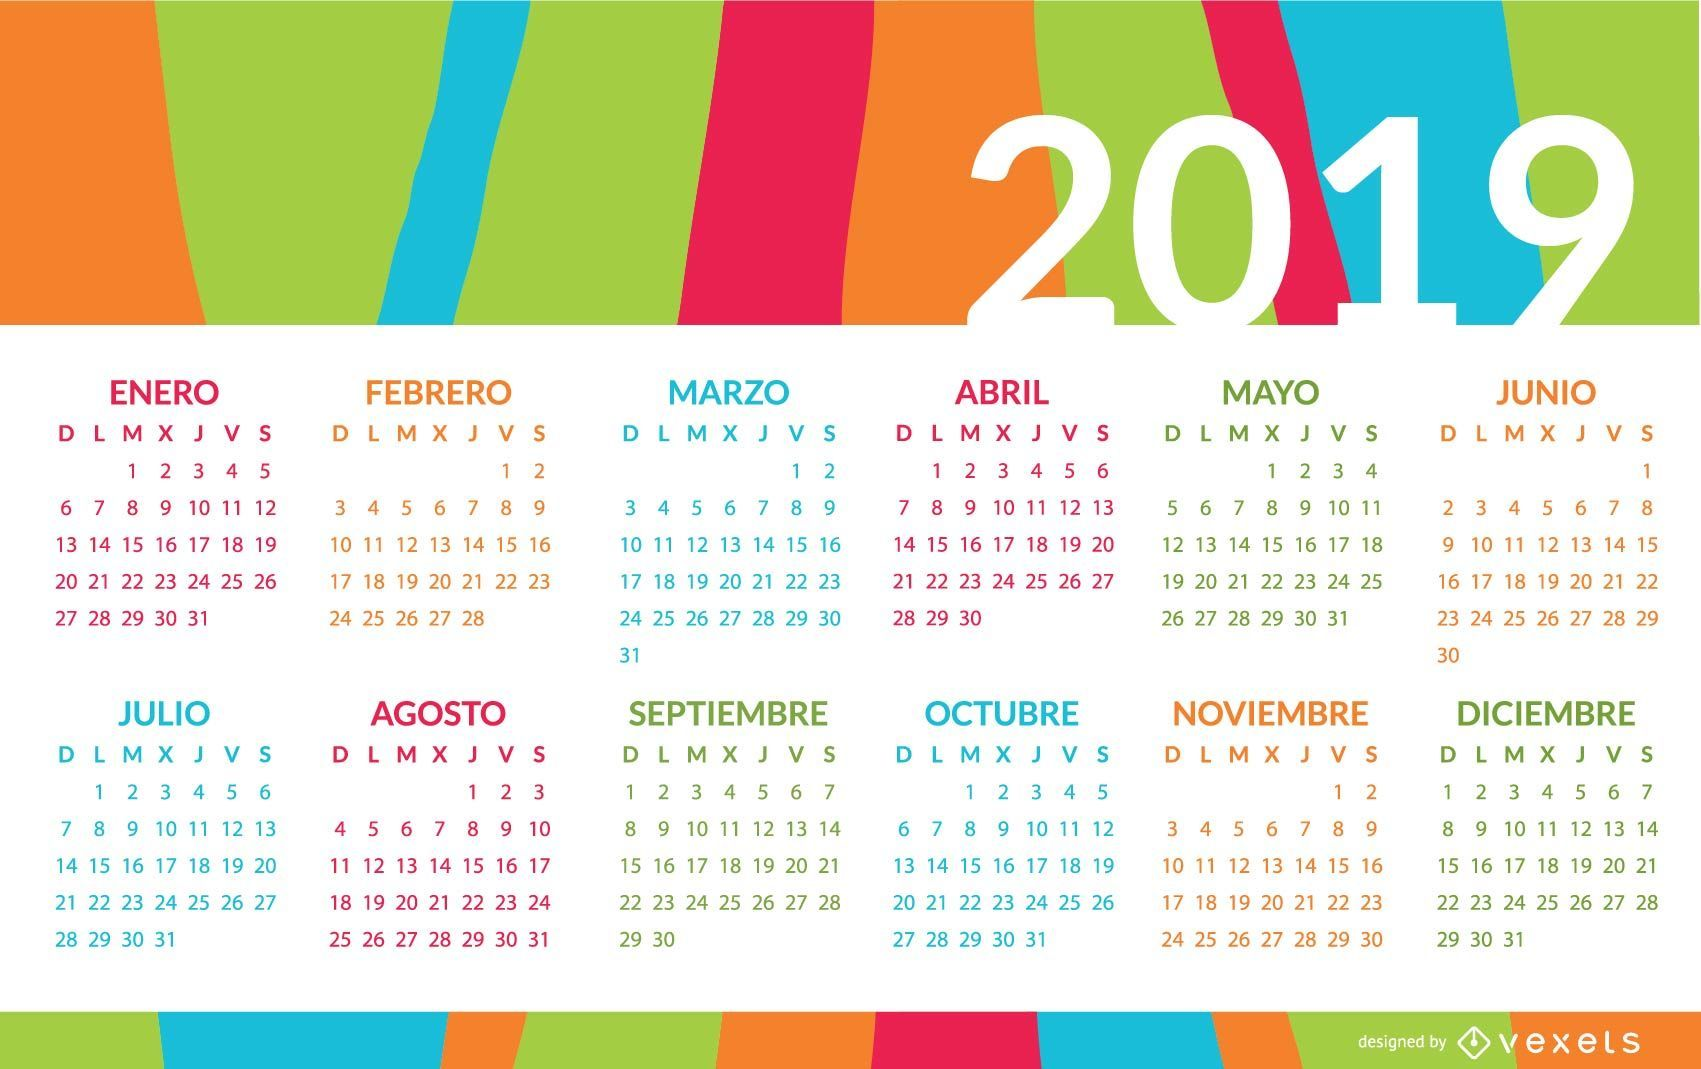 Colorful Spanish Calendar Design